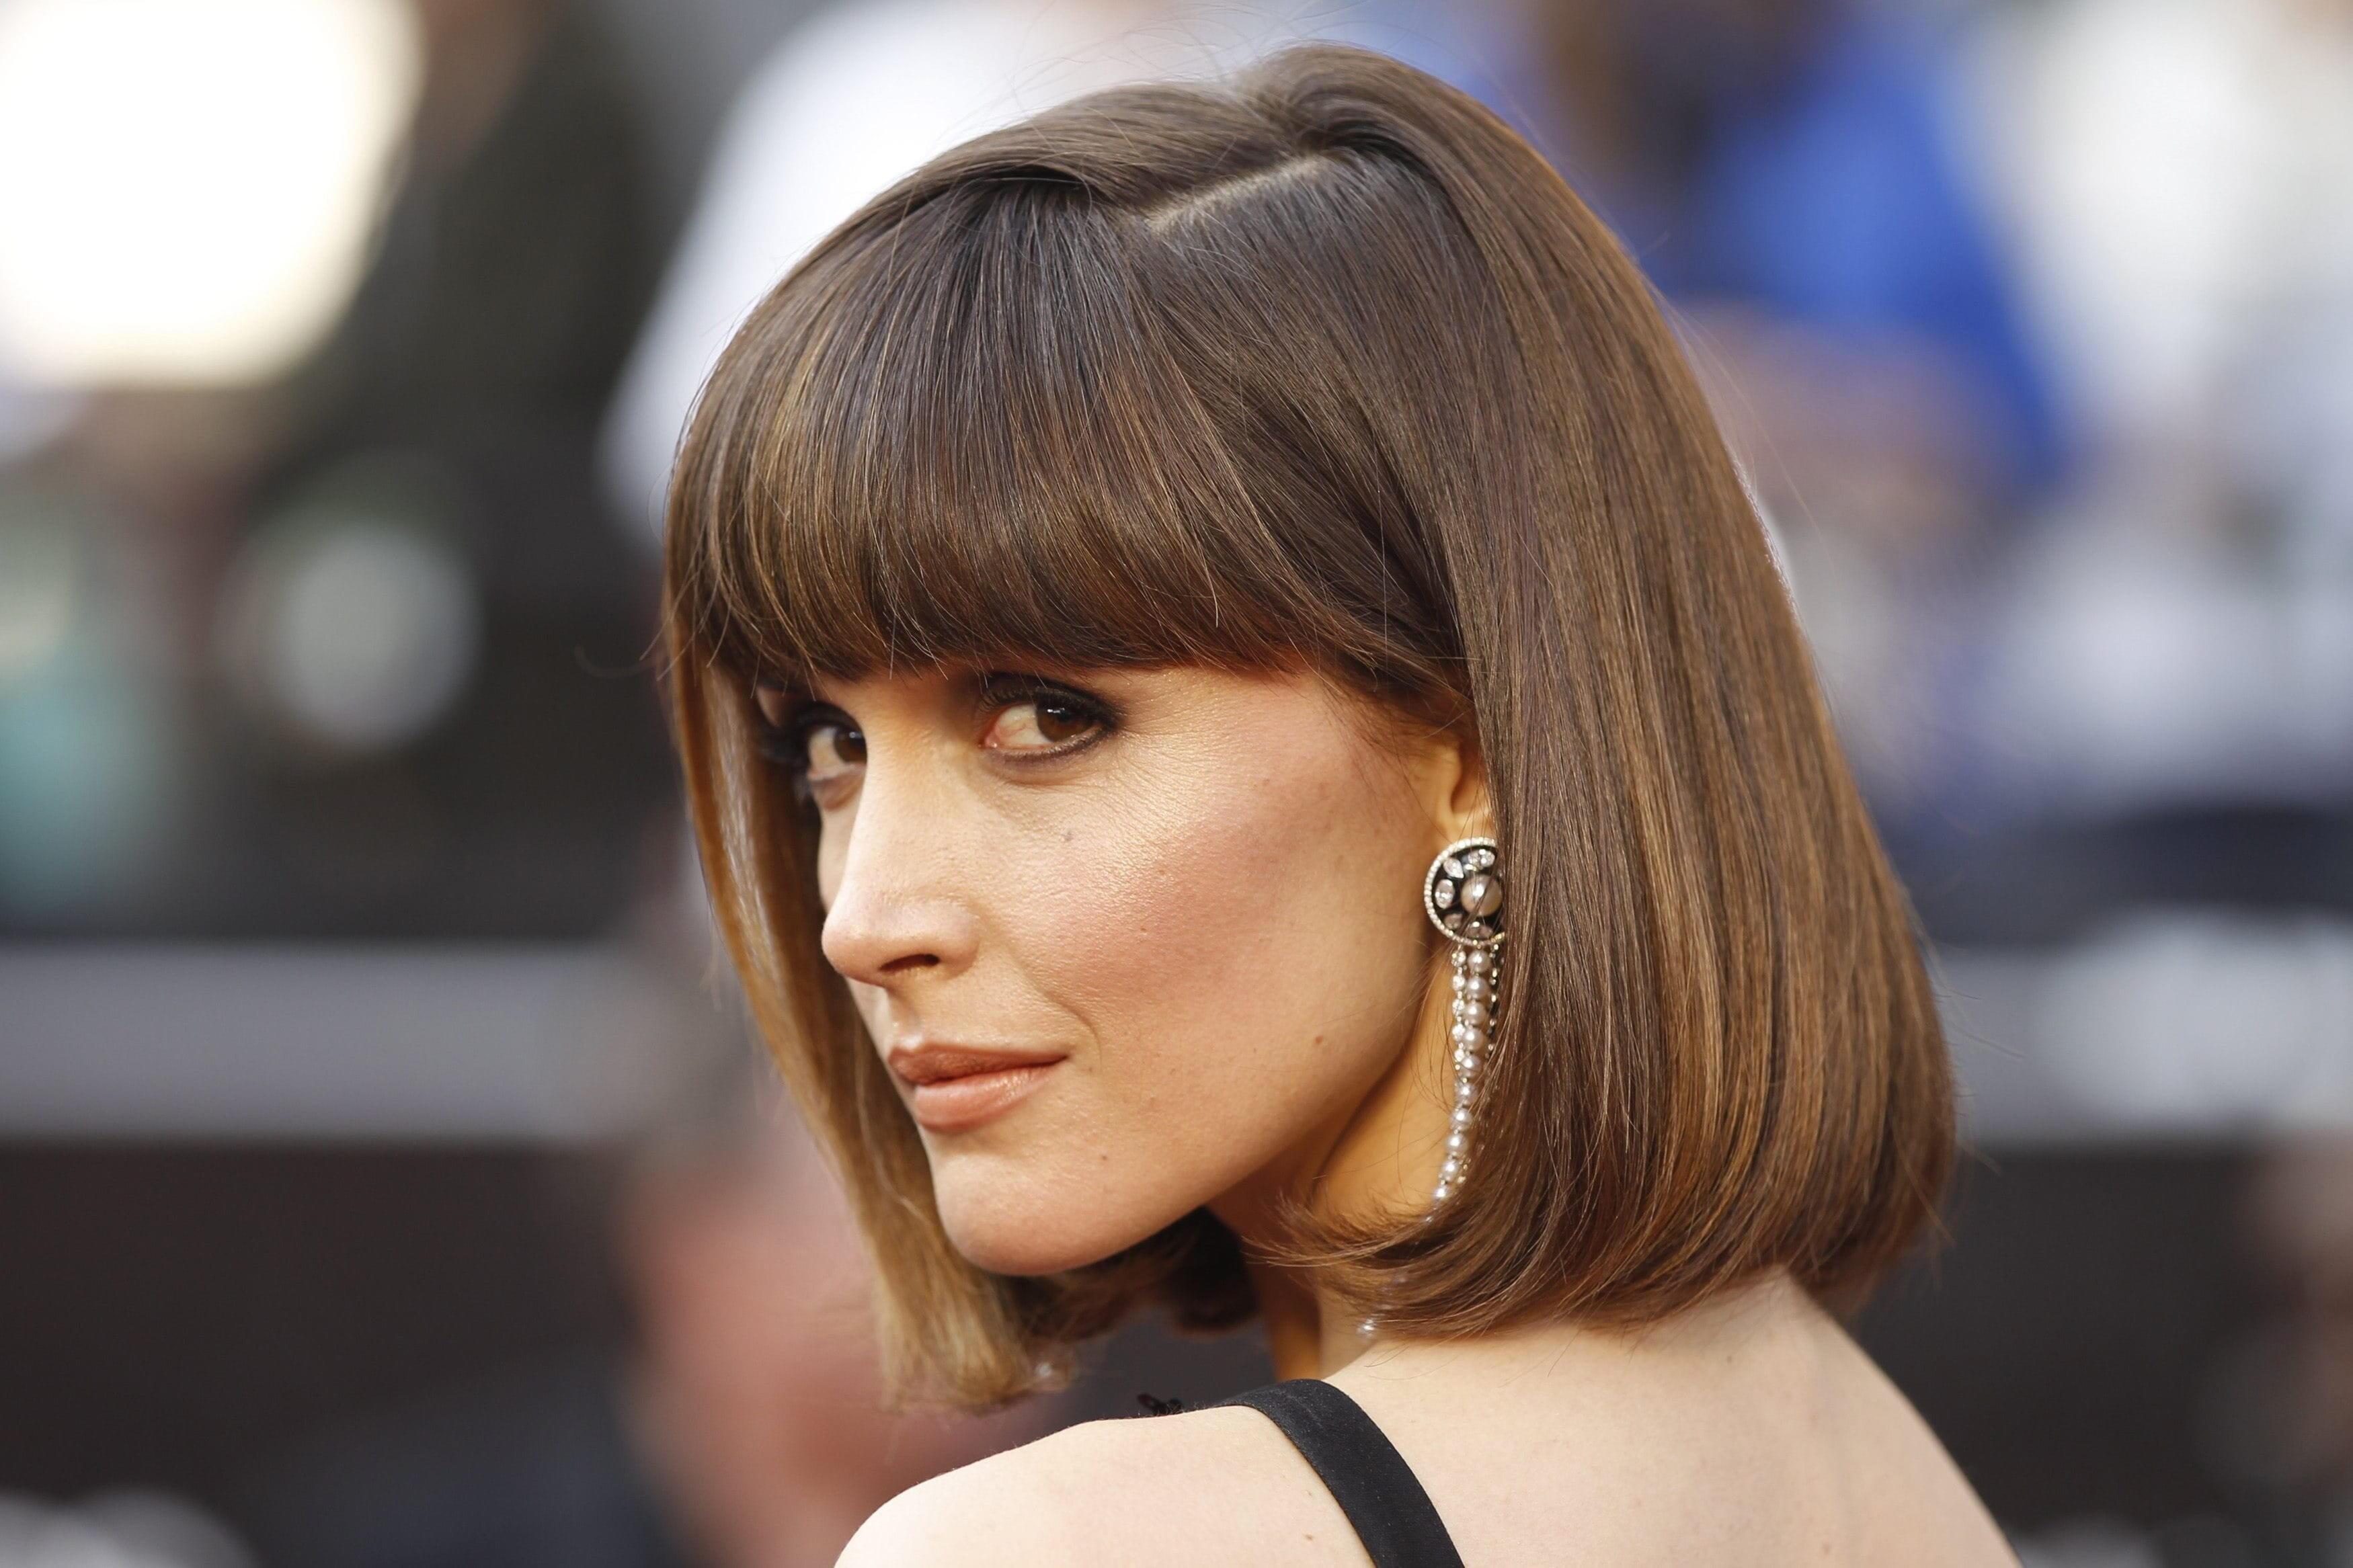 A Bang Dengan Bangs 9 Pilihan Untuk Potongan Rambut Wanita Untuk Rambut Pendek Dan Sederhana